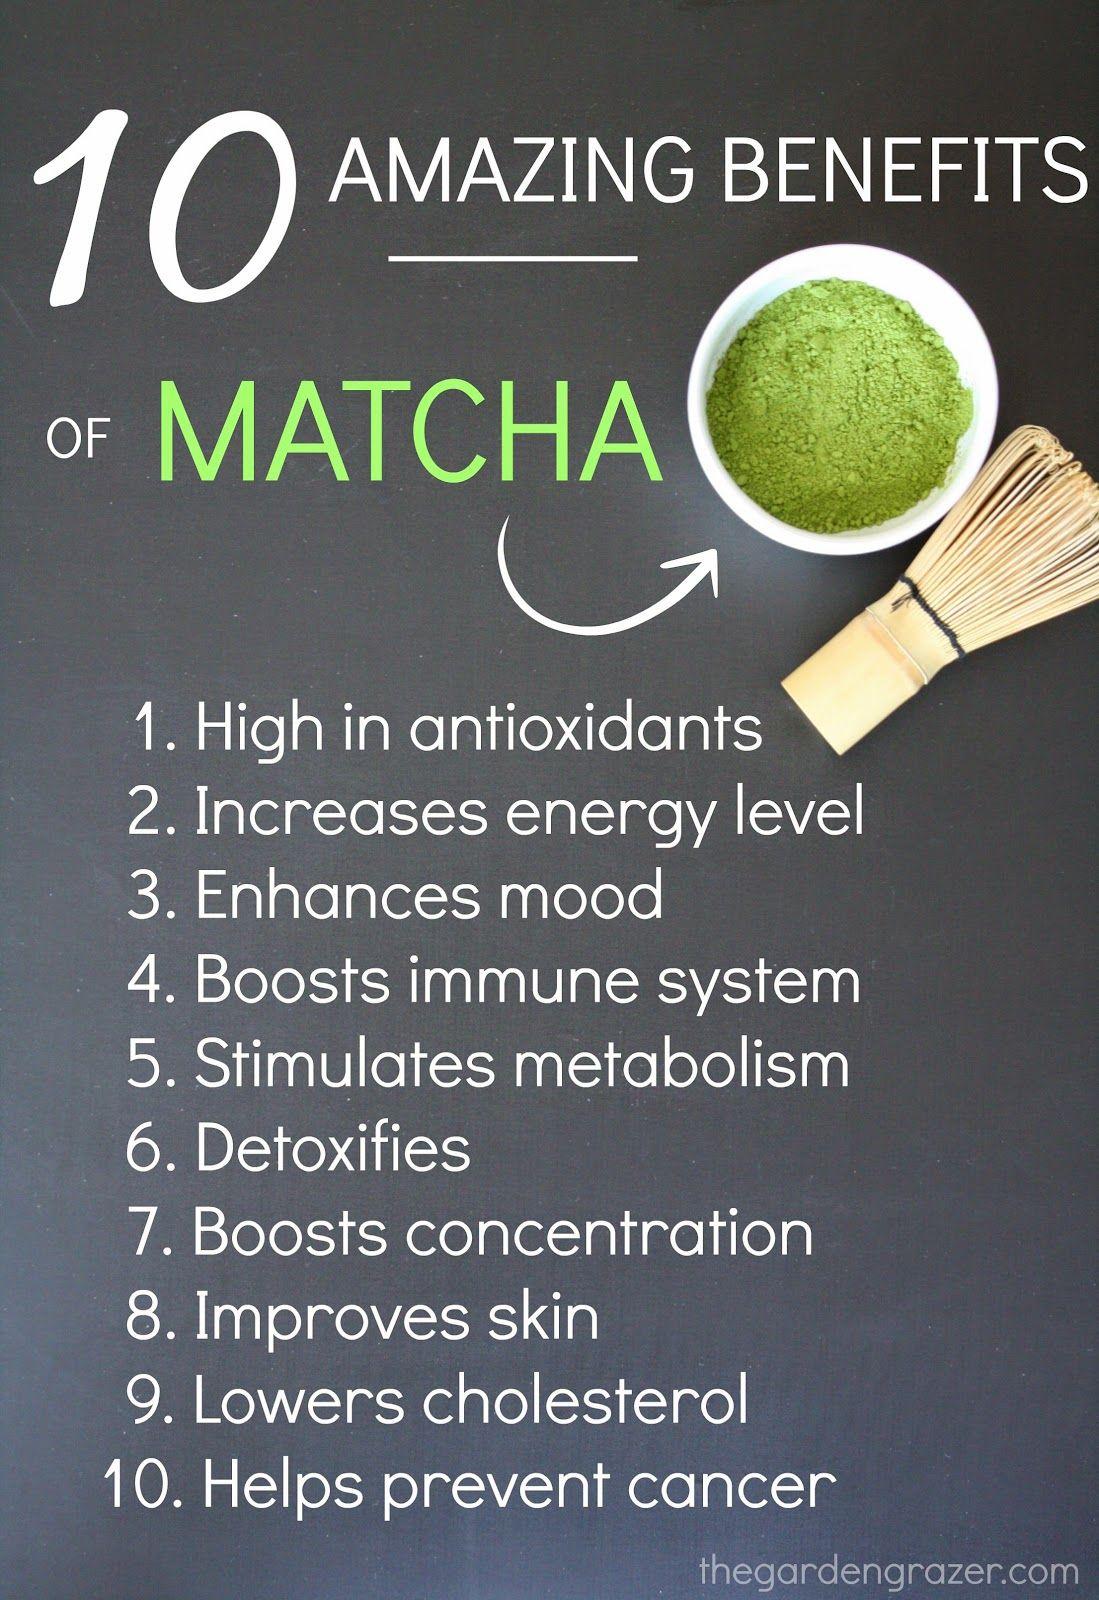 The Garden Grazer: 10 Amazing Health Benefits of Matcha